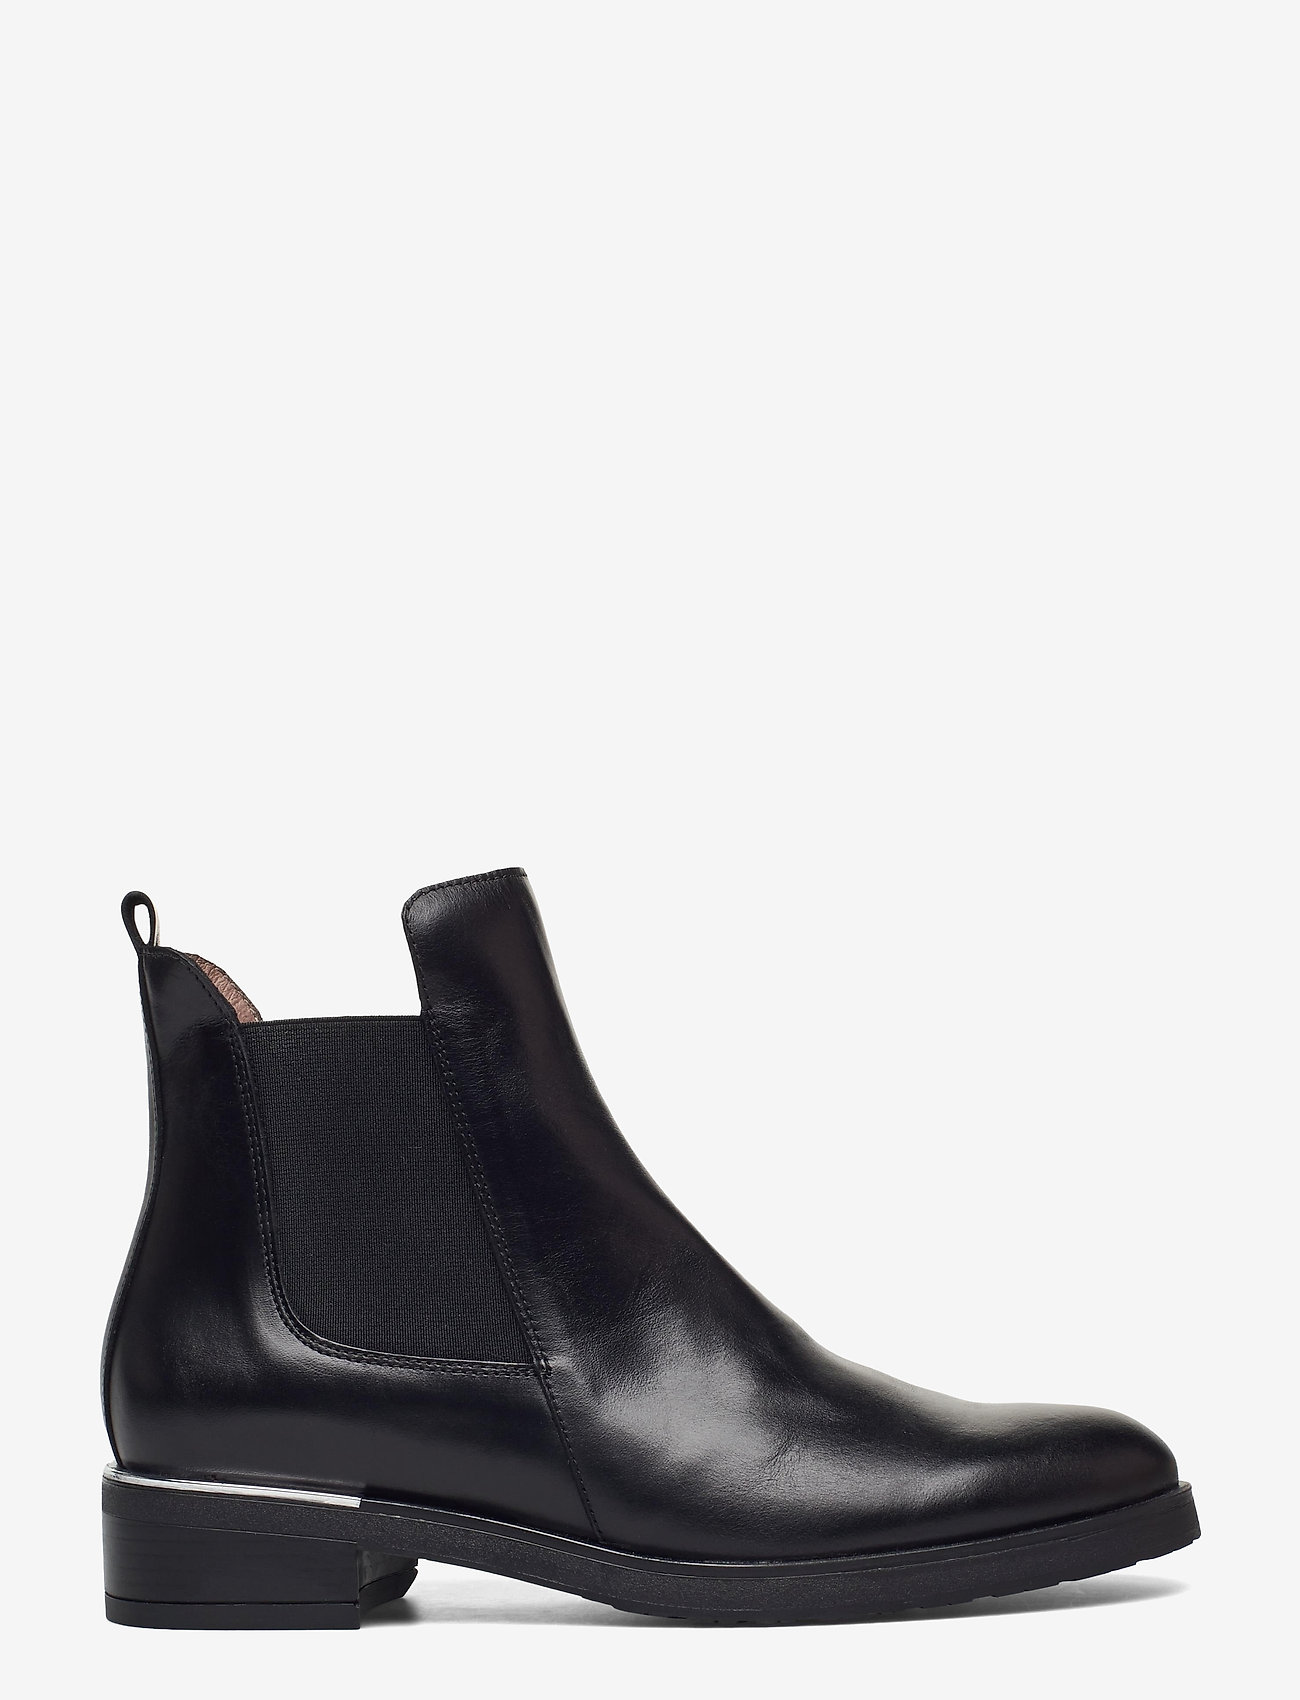 Wonders - C-5431 - chelsea boots - black - 1